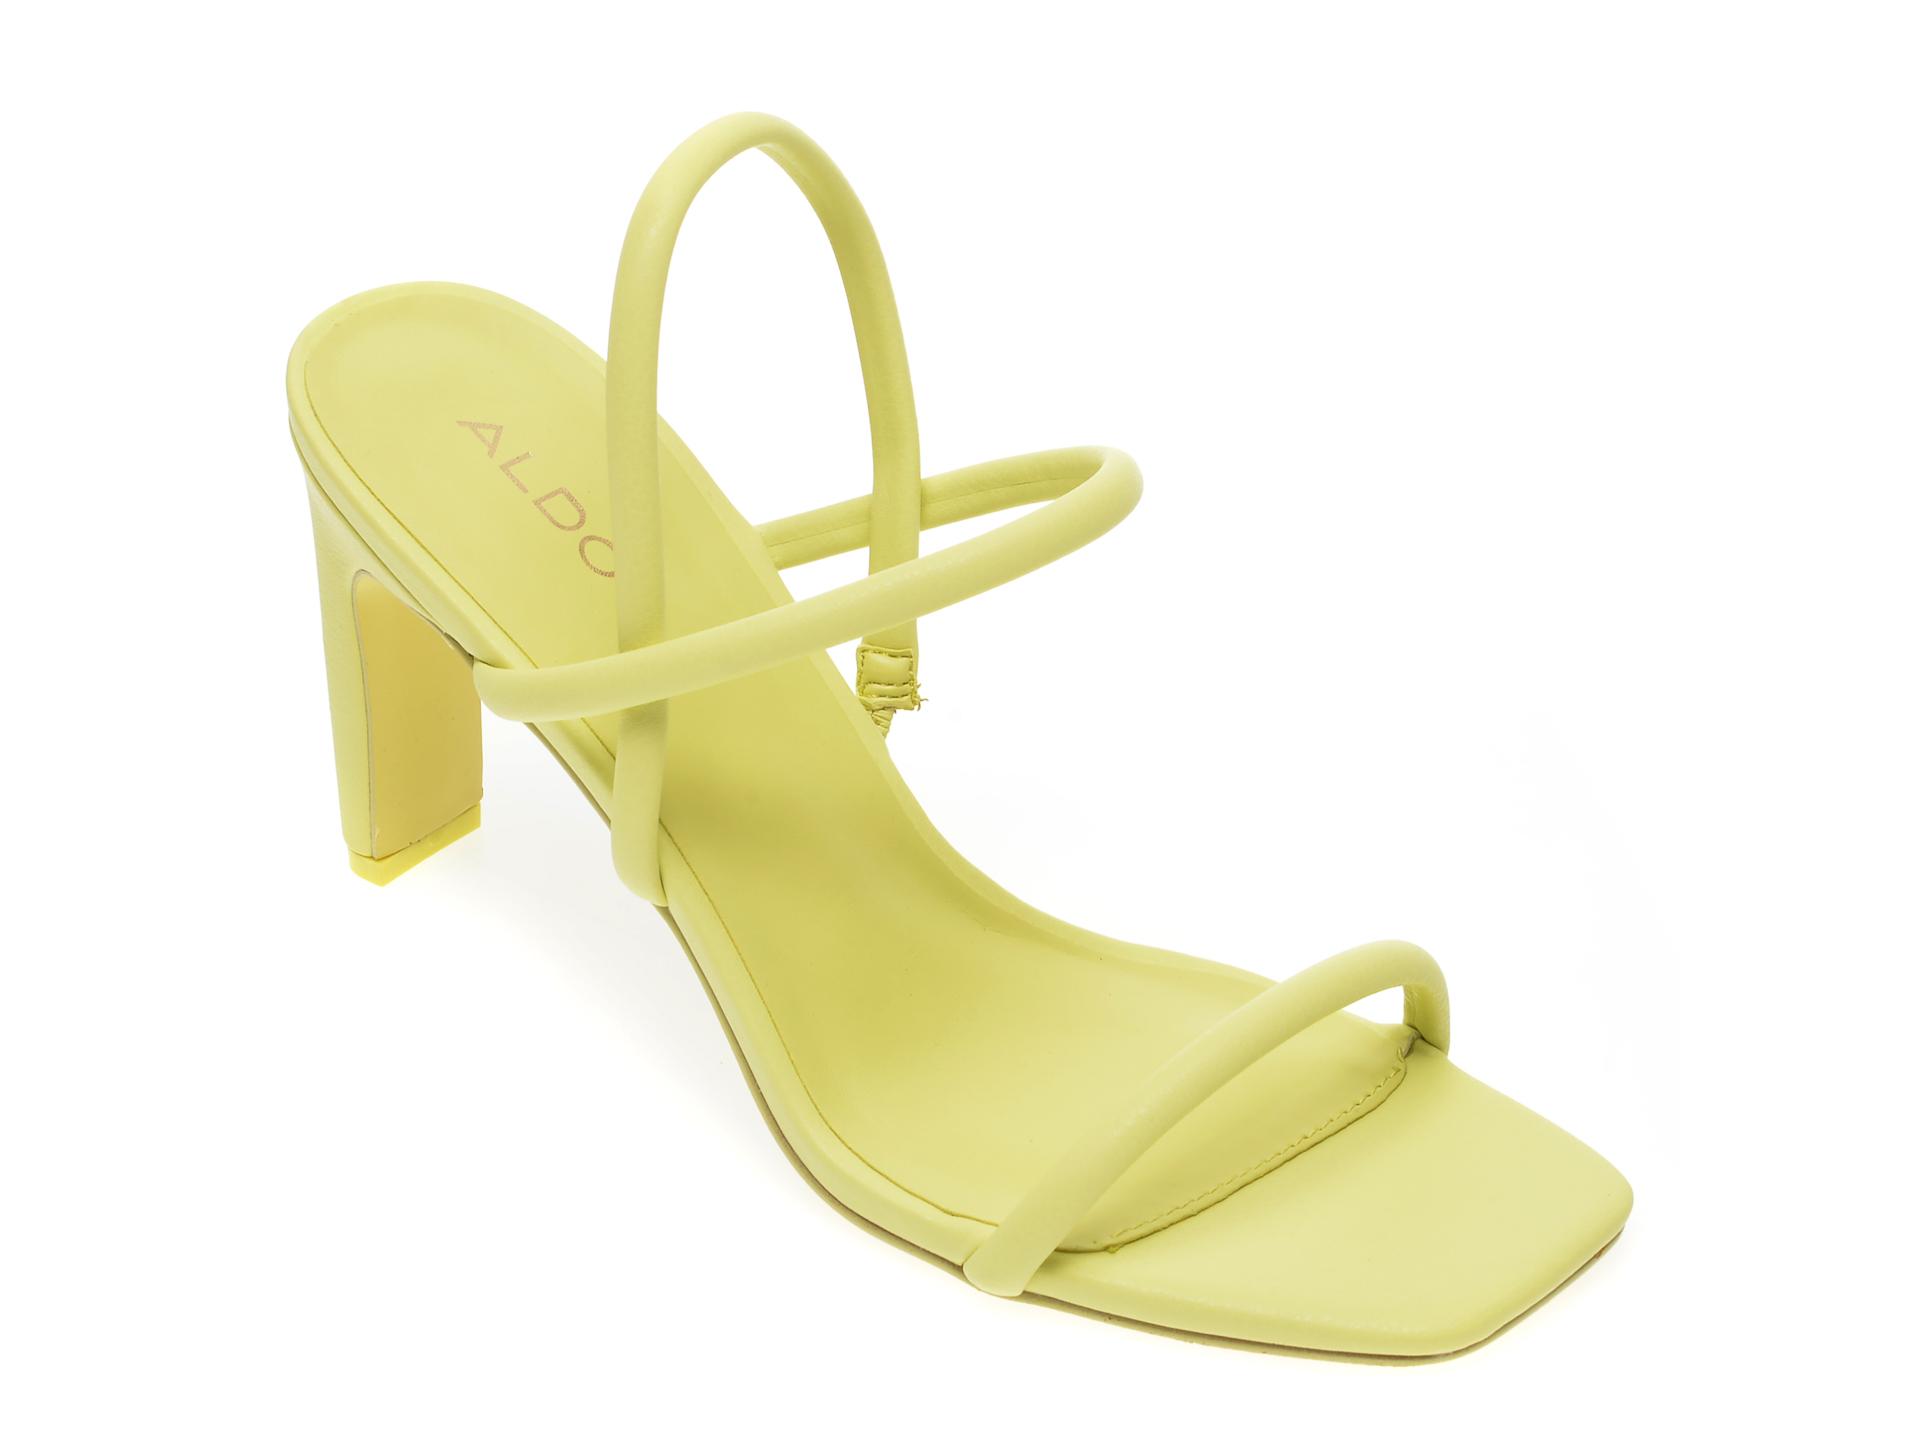 Sandale ALDO verzi, Karla330, din piele ecologica imagine otter.ro 2021